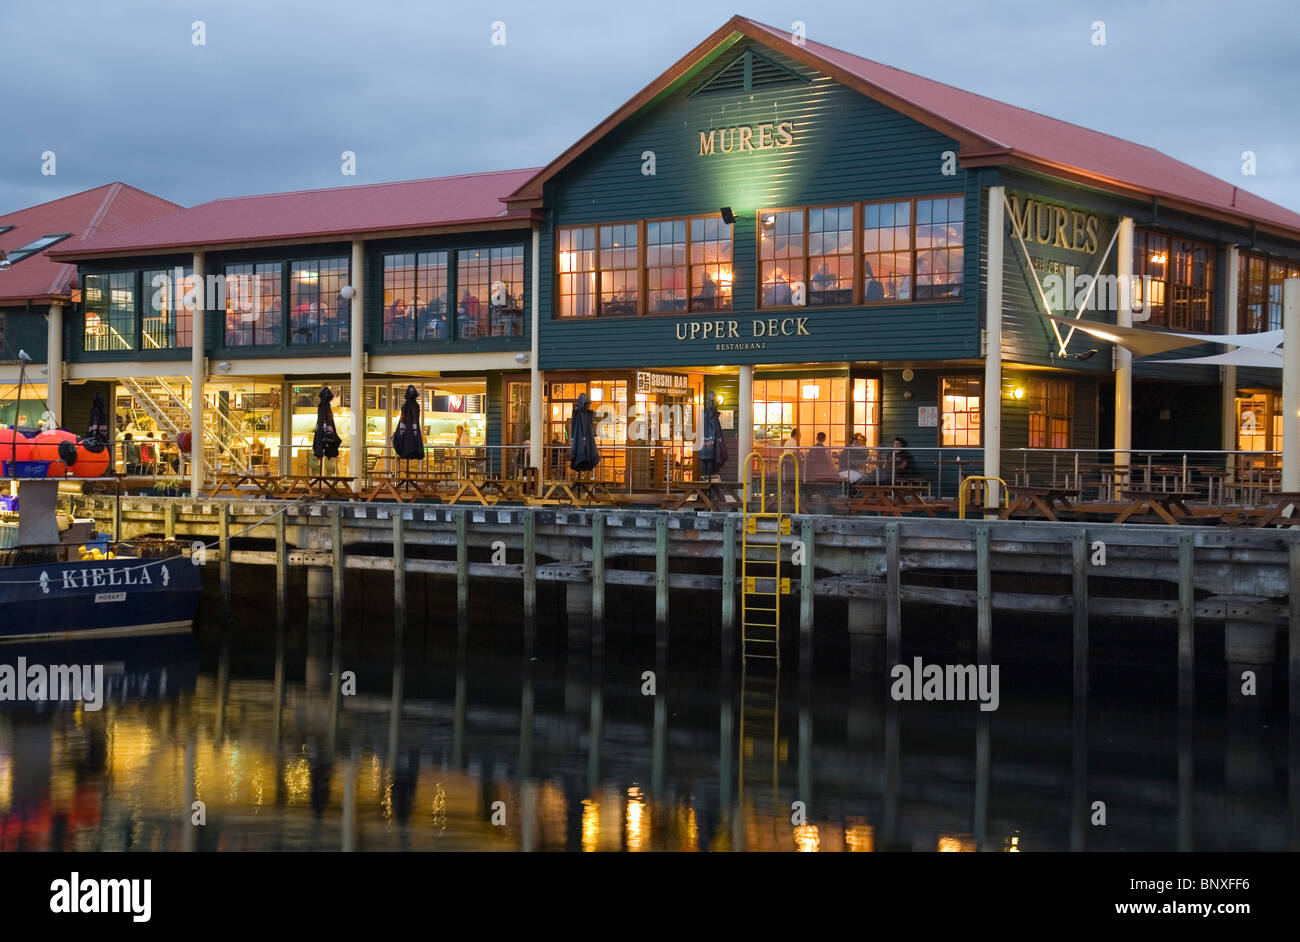 Mures - Bistro de la mer sur Victoria Dock. Sullivans Cove, Hobart, Tasmanie, Australie Photo Stock